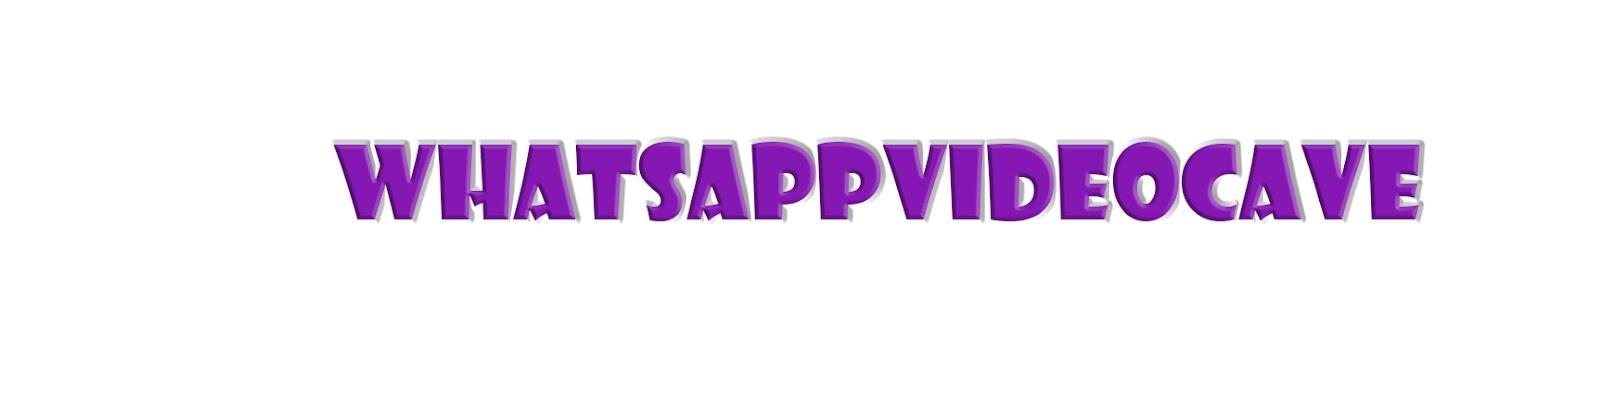 Latest Whatsapp Status Videos 2021 Free Download